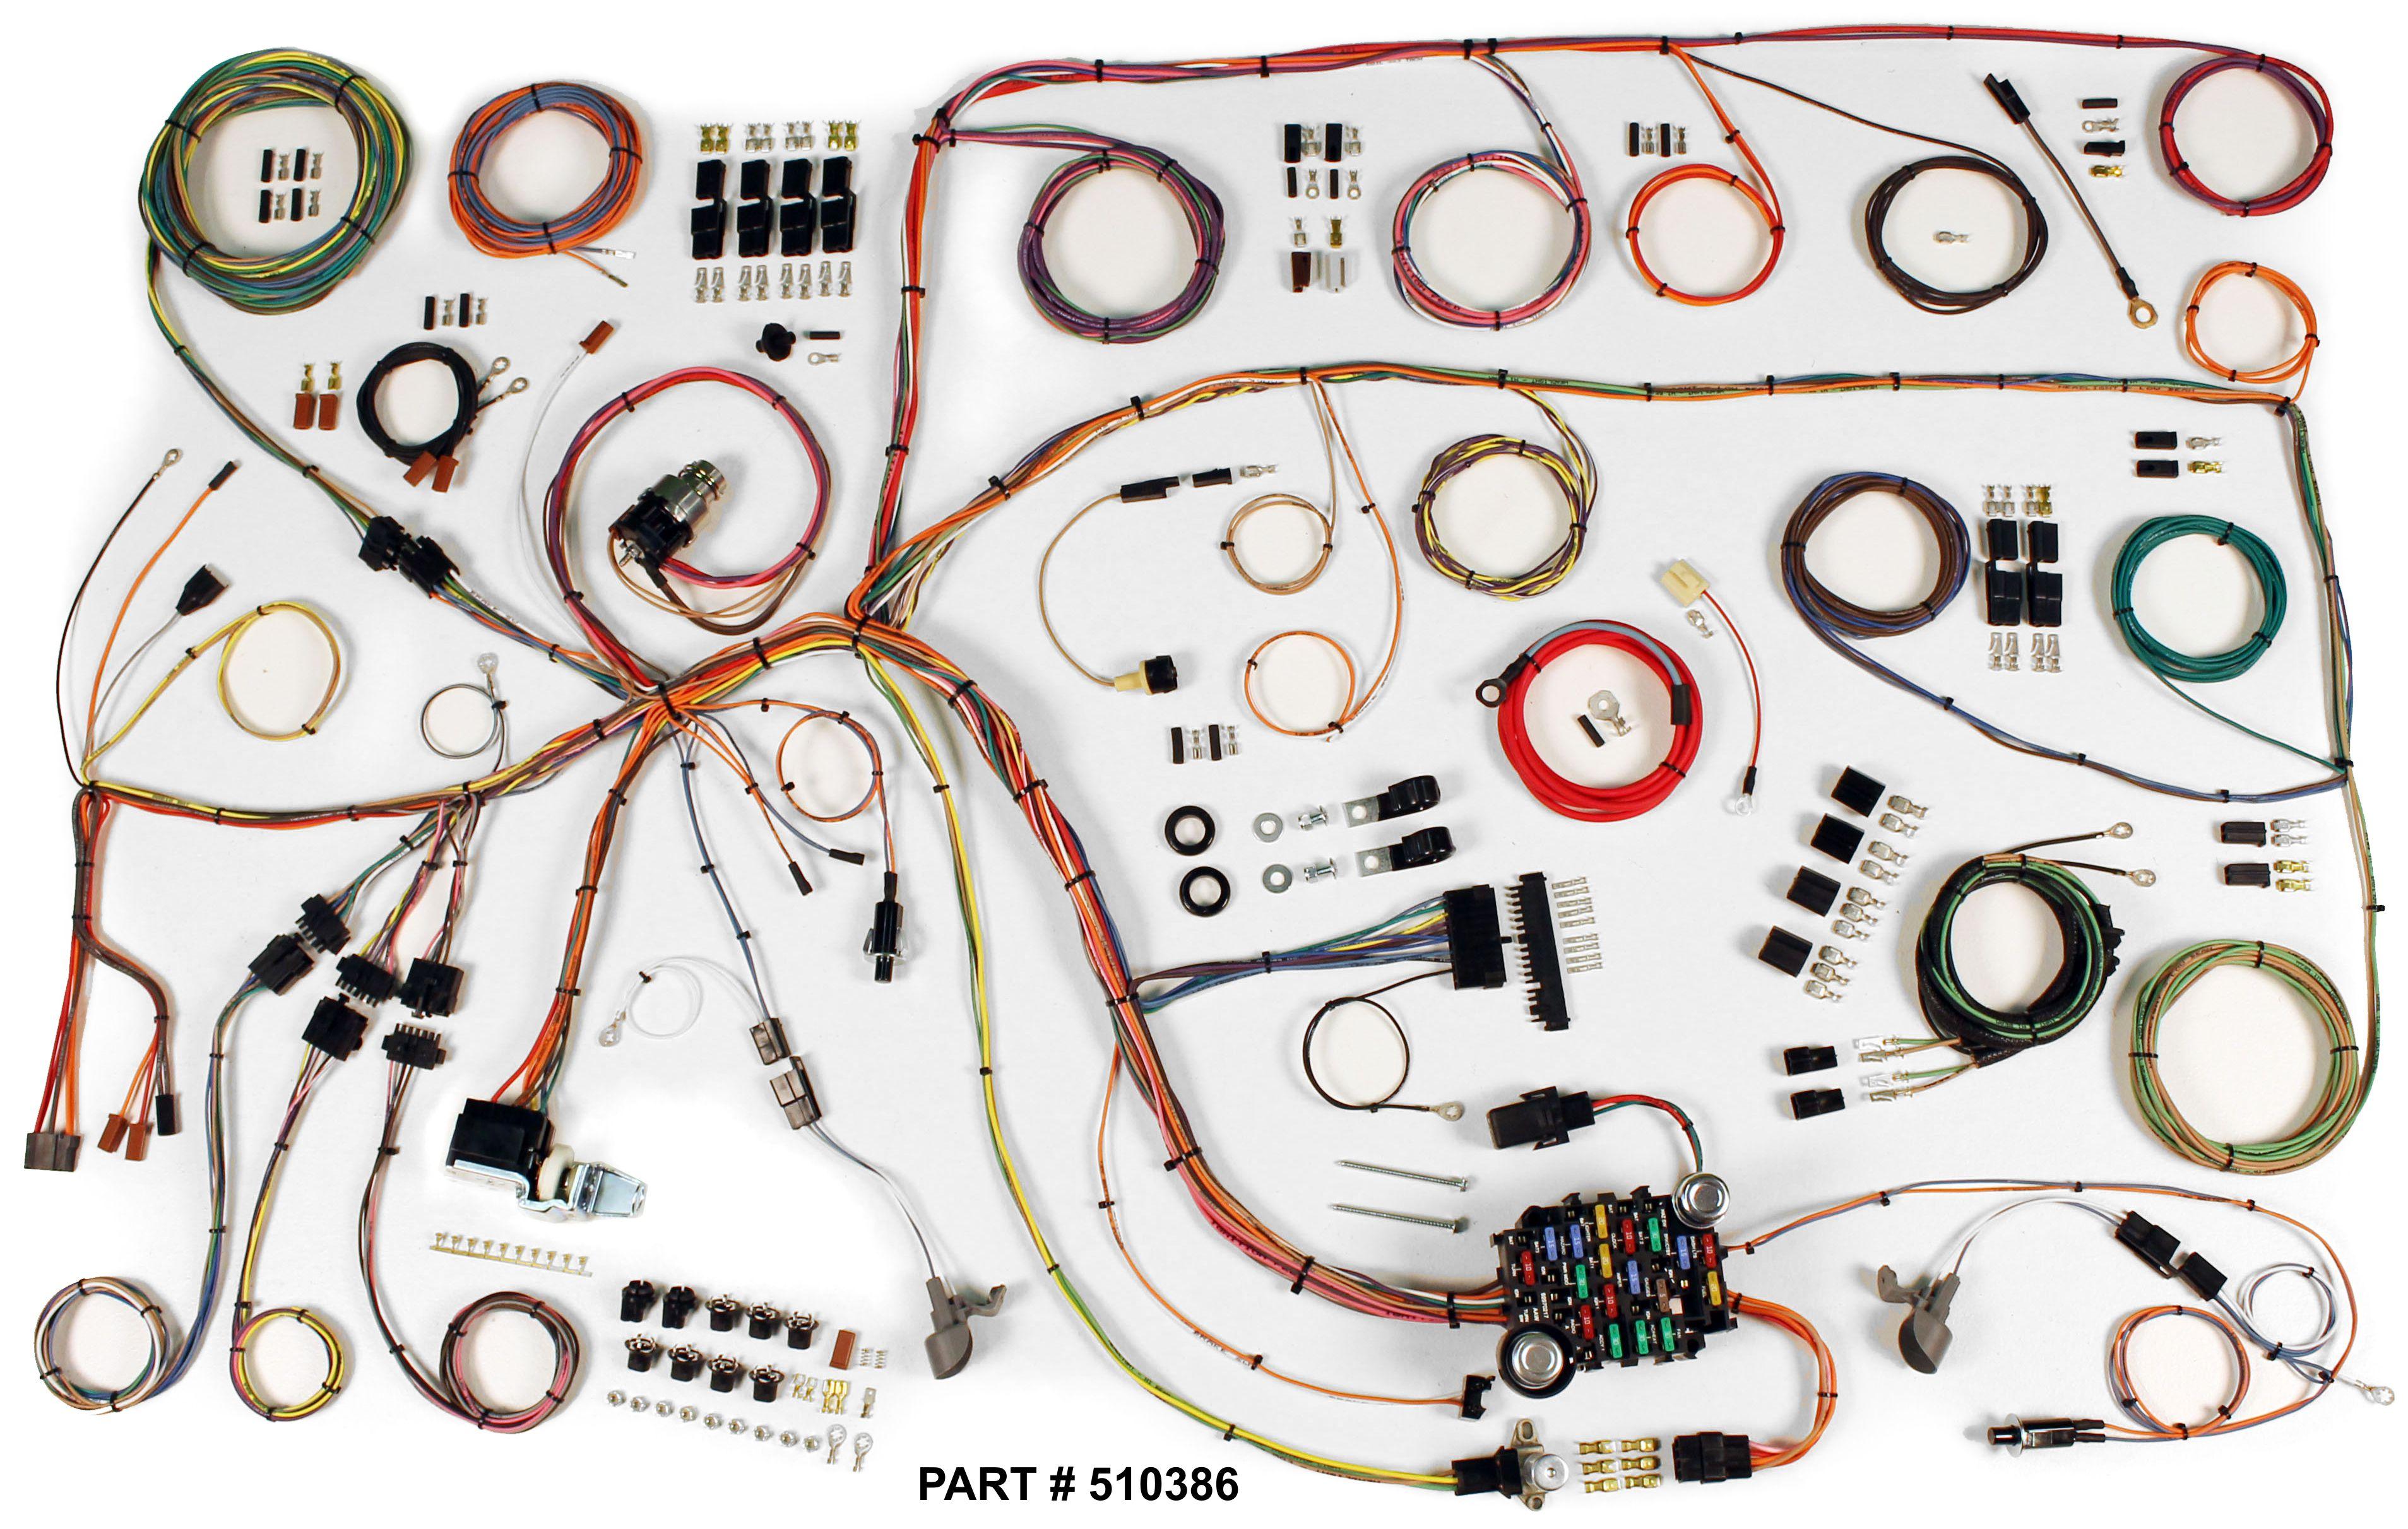 1924 ford model t wiring diagram ferguson t20 harness data site